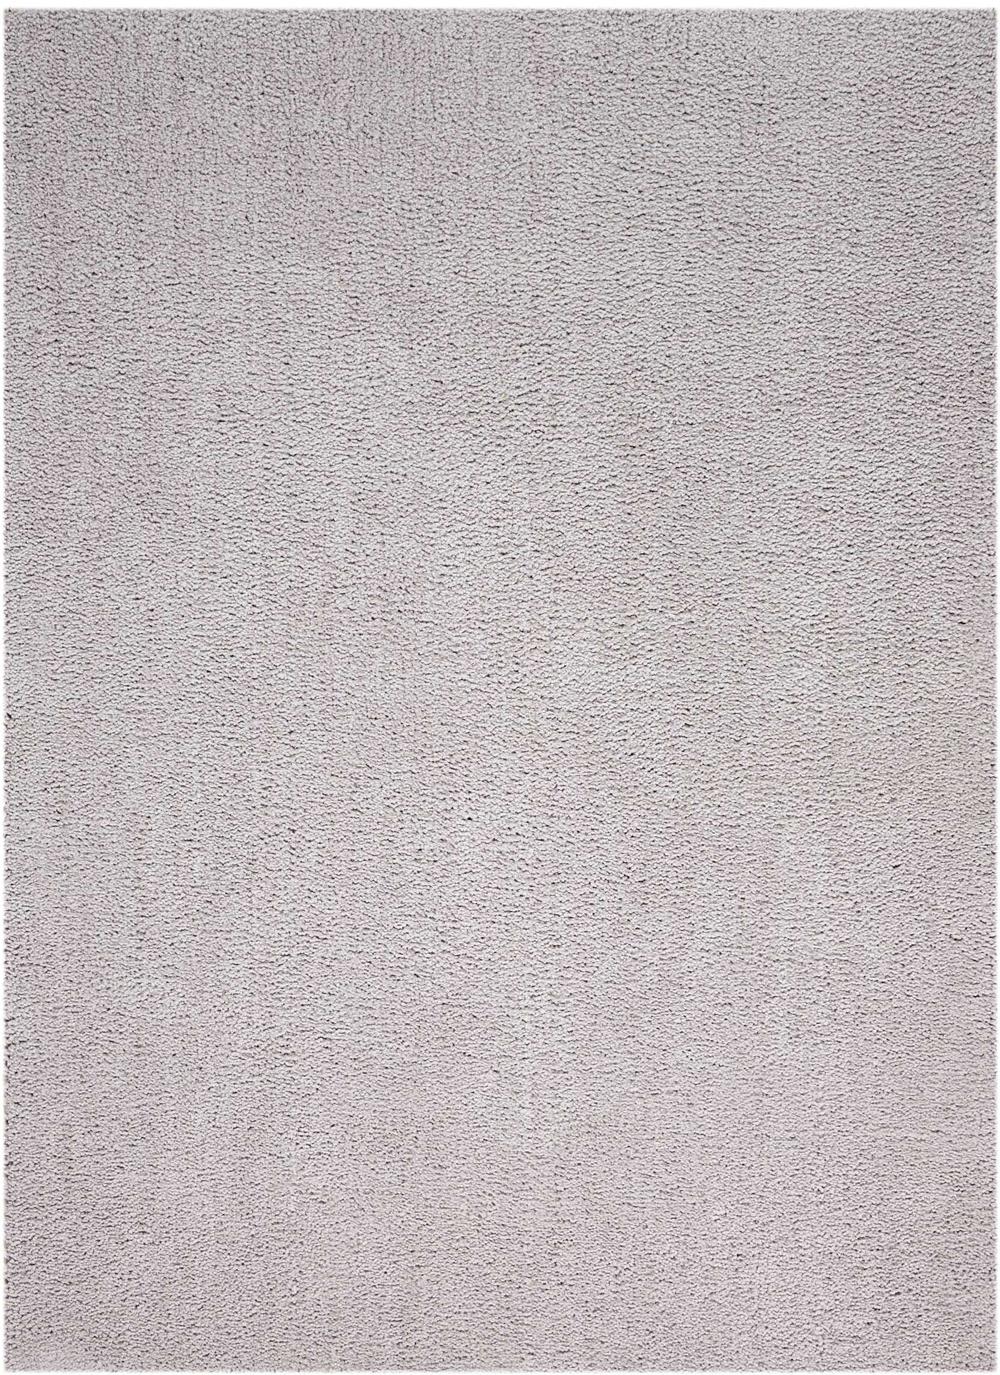 Nourison COZY SHAG COZ01 SILVER Rug